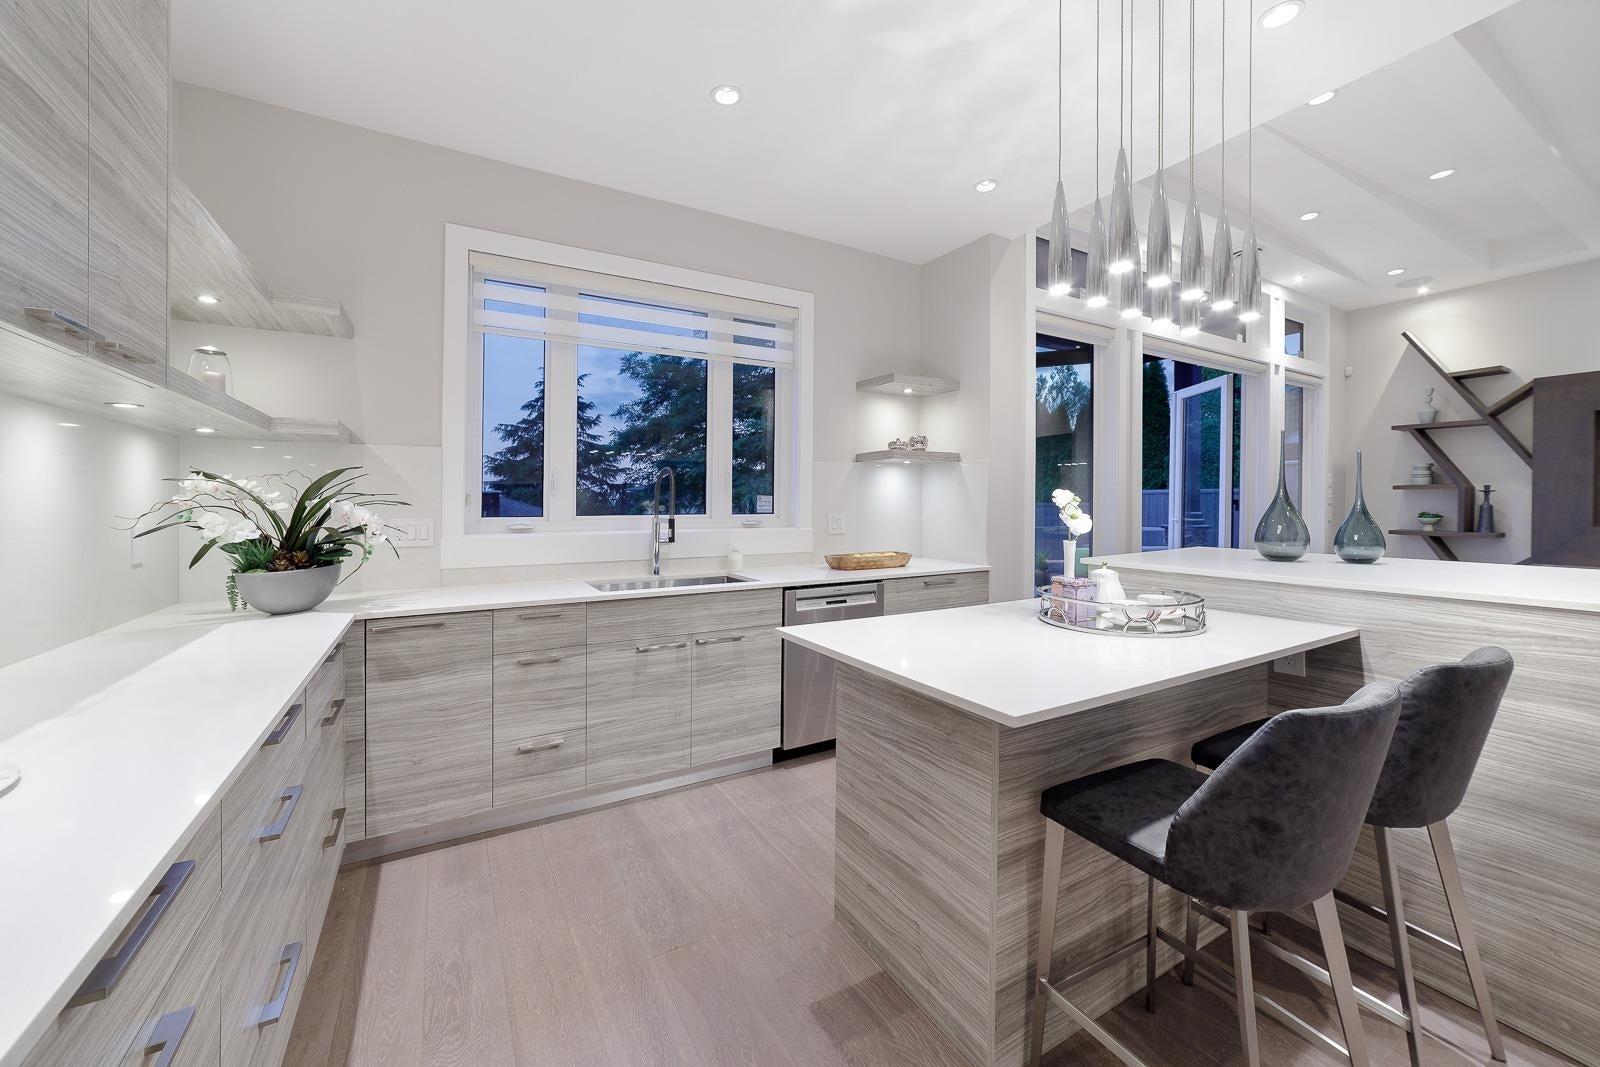 517 GRANADA CRESCENT - Upper Delbrook House/Single Family for sale, 8 Bedrooms (R2615057) - #8